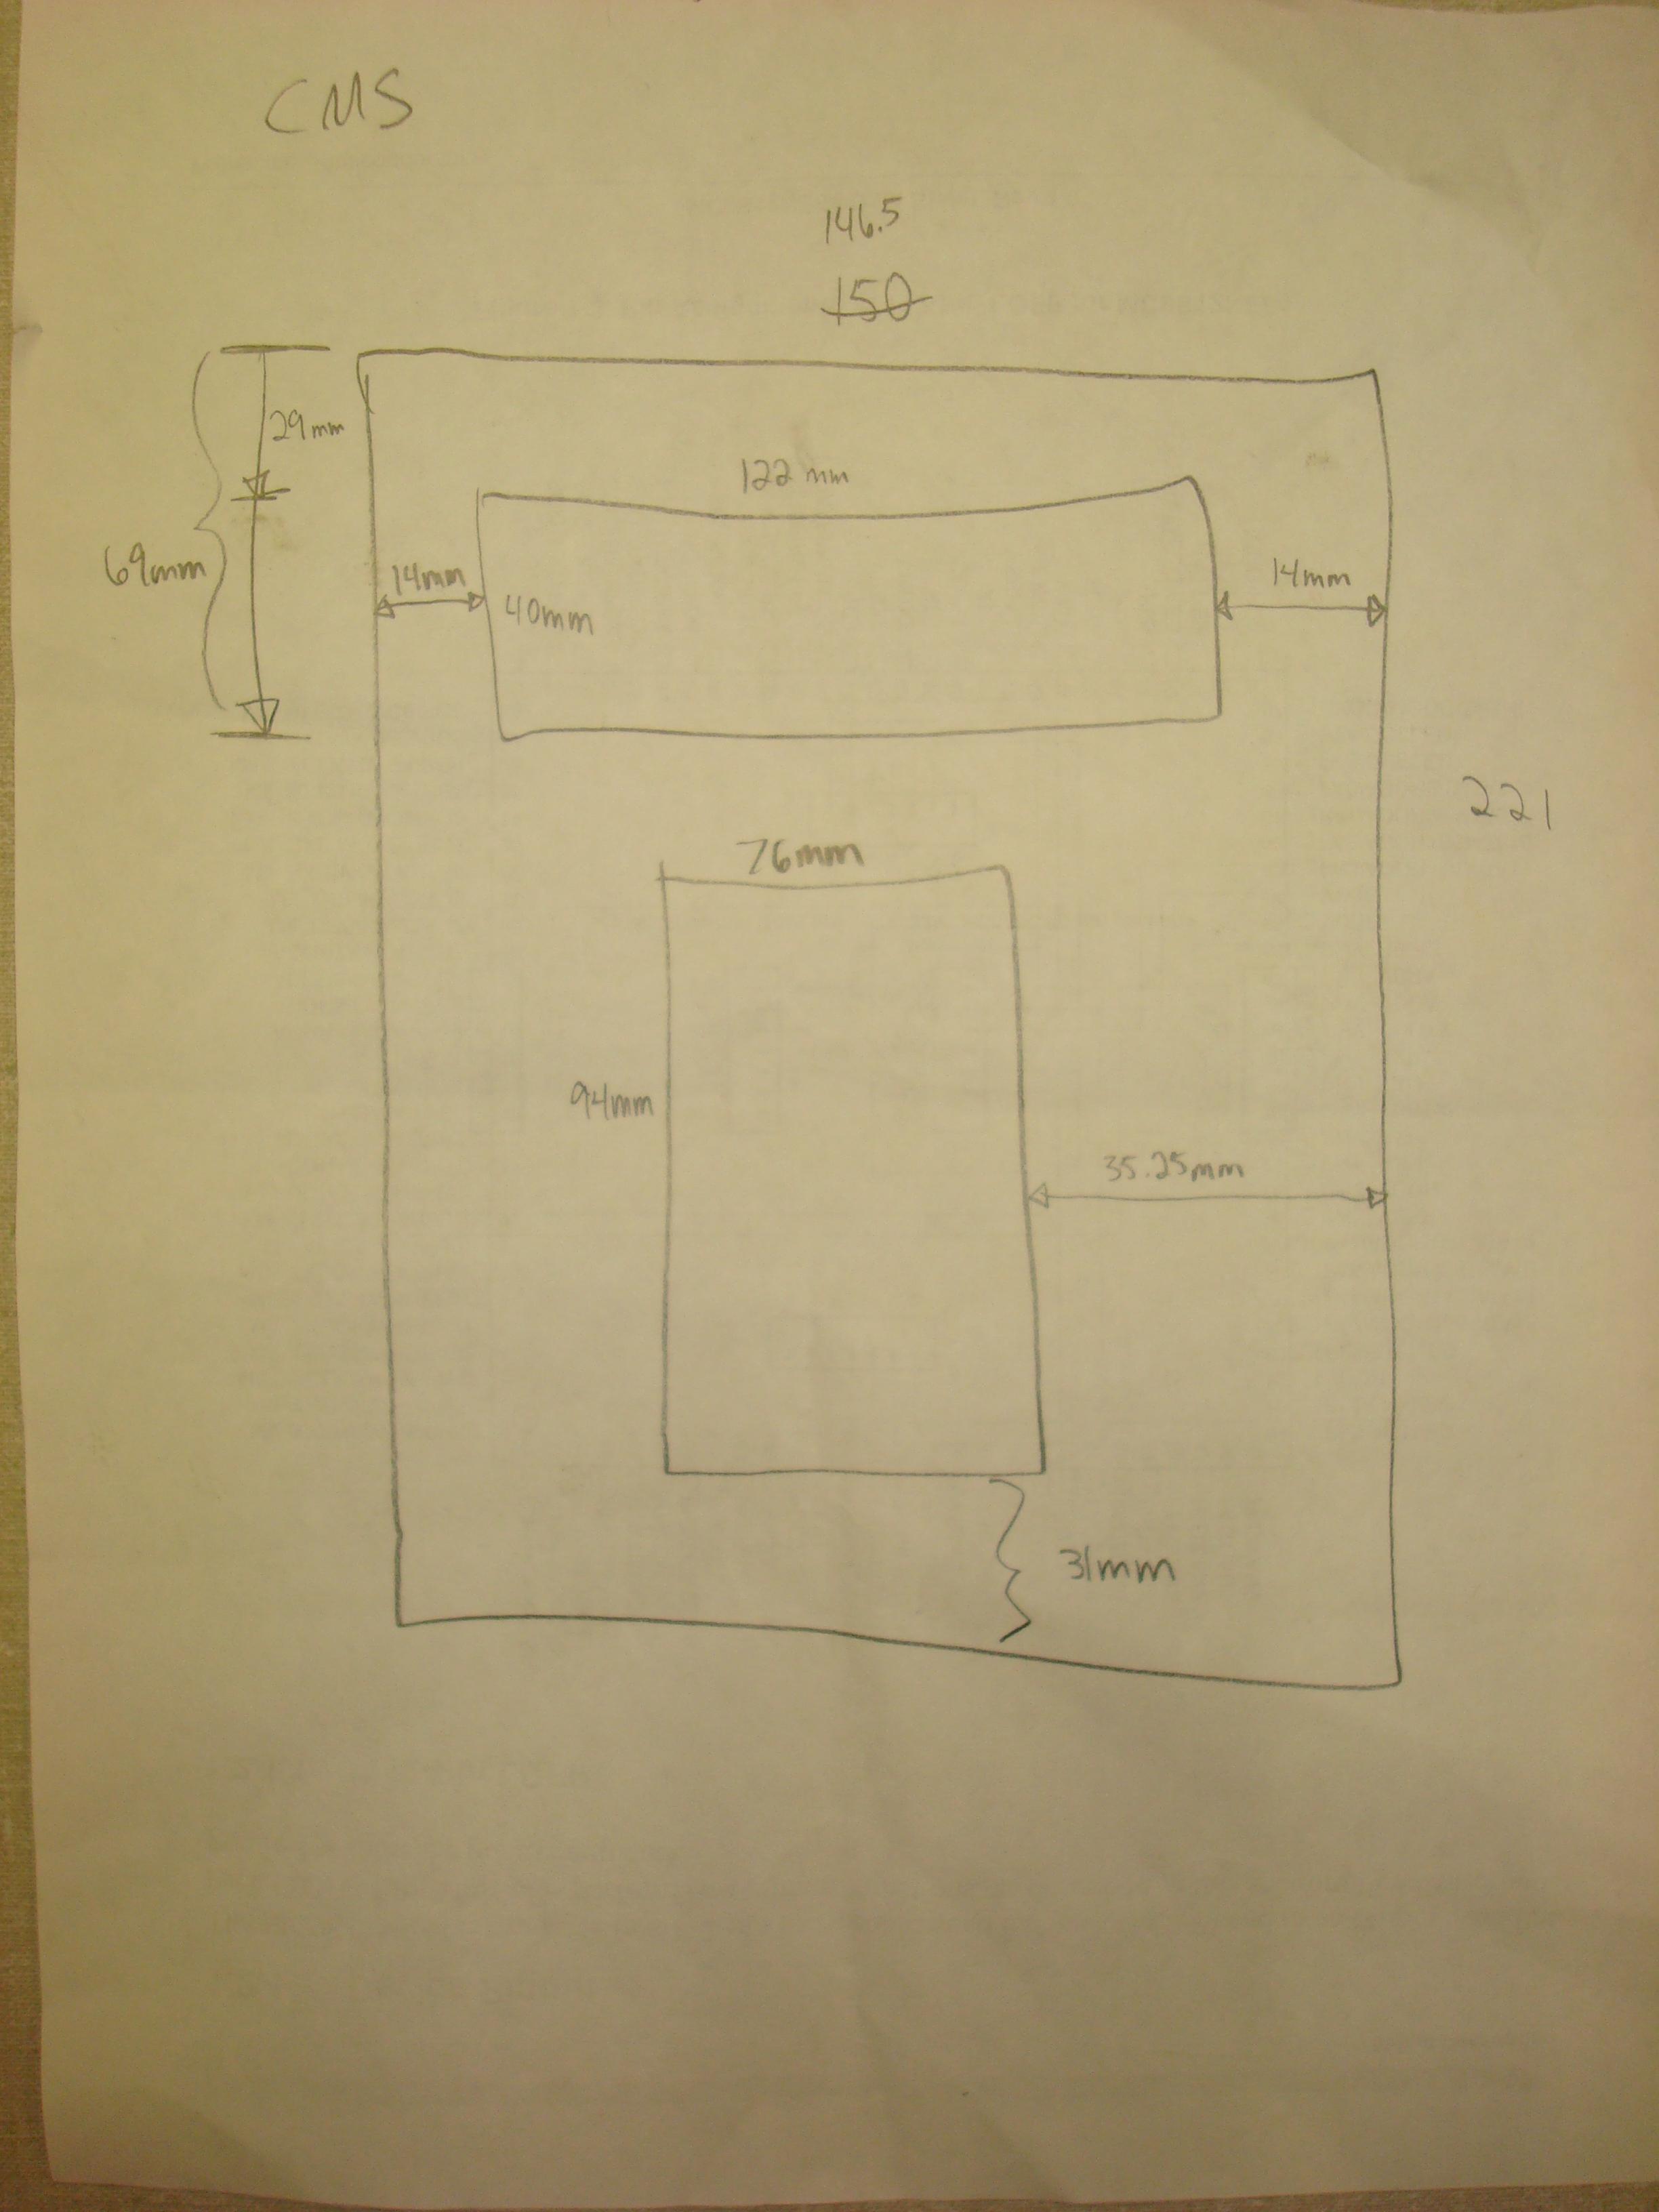 Stuart Pulliams Lab Notebook Filepotential Divider Circuit Diagramjpg Wikipedia Vertical Rsu Design